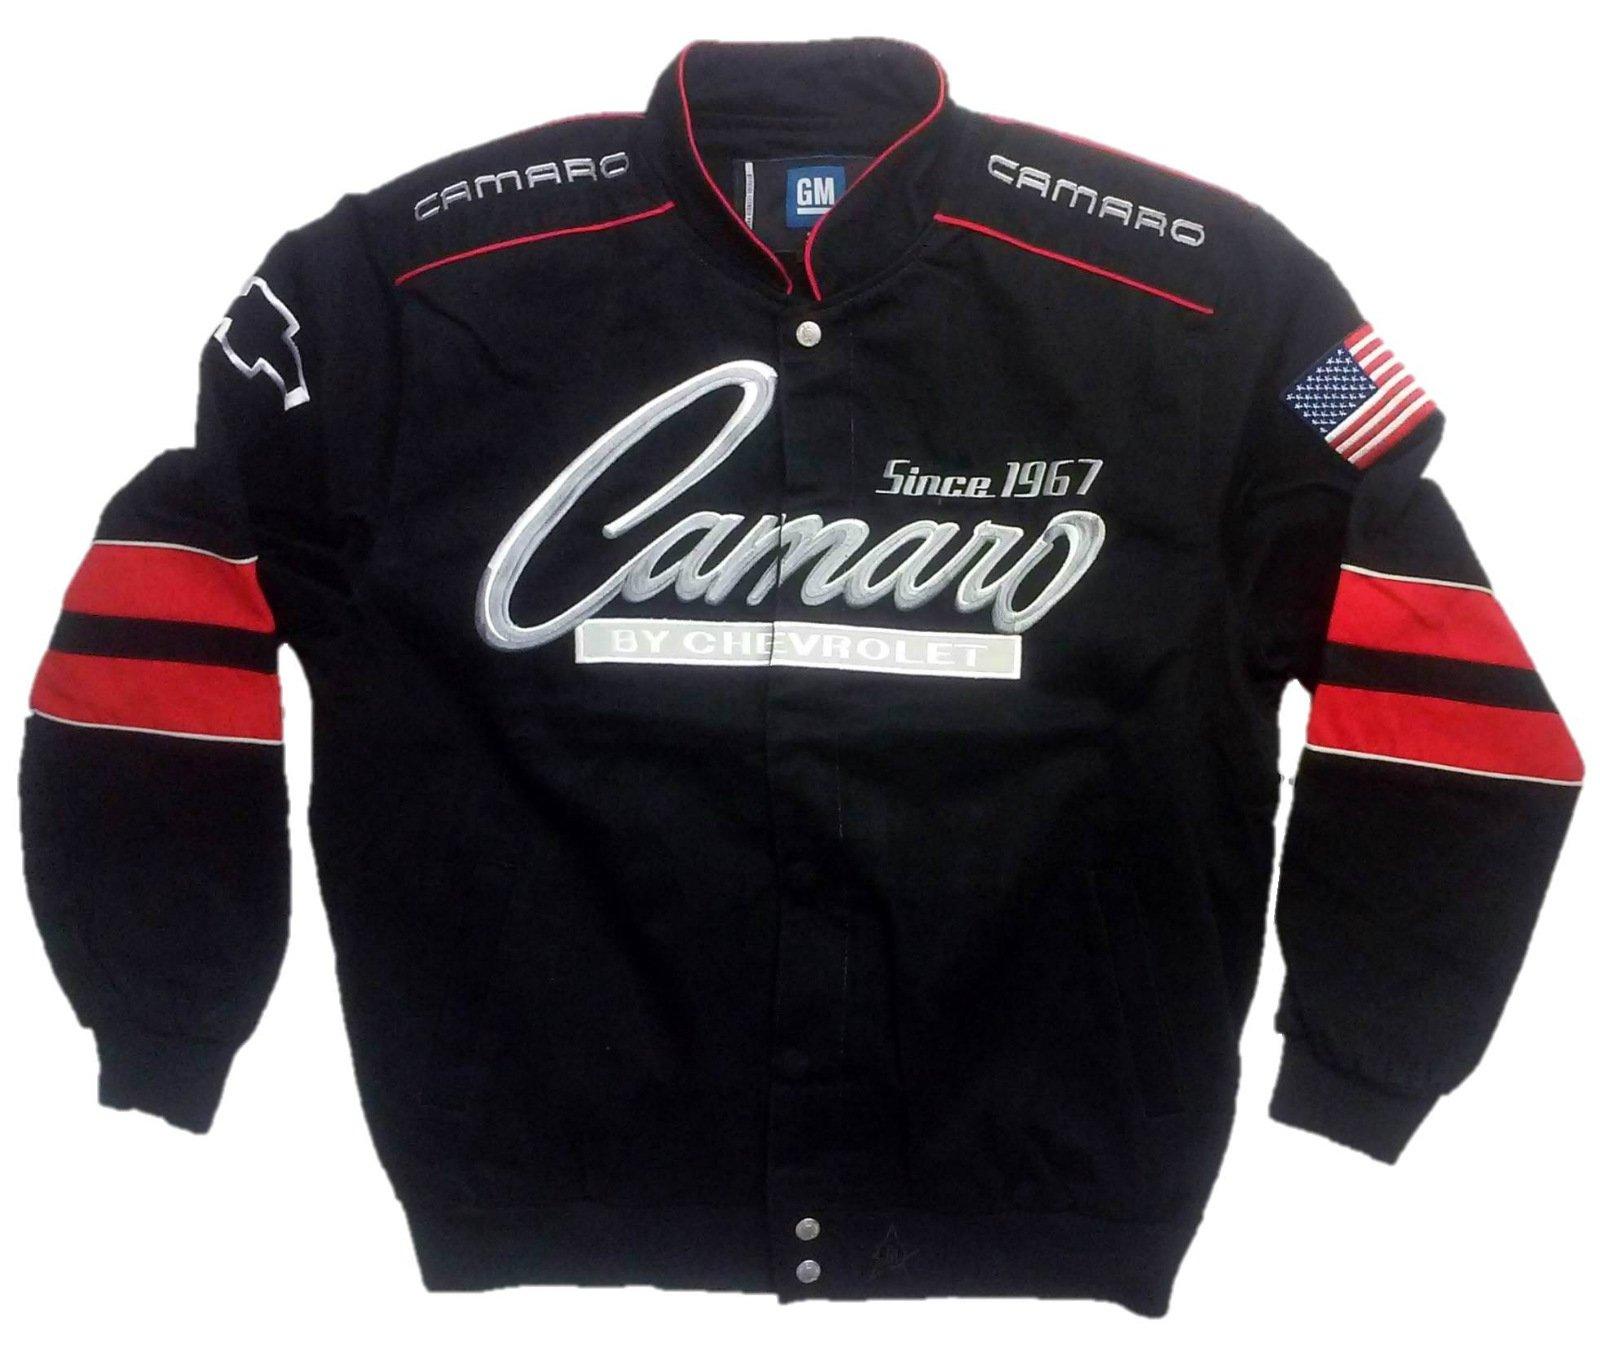 J.H. Design JH Design Chevy Camaro Cotton Twill Jacket, XXX-Large, Black by J.H. Design (Image #1)